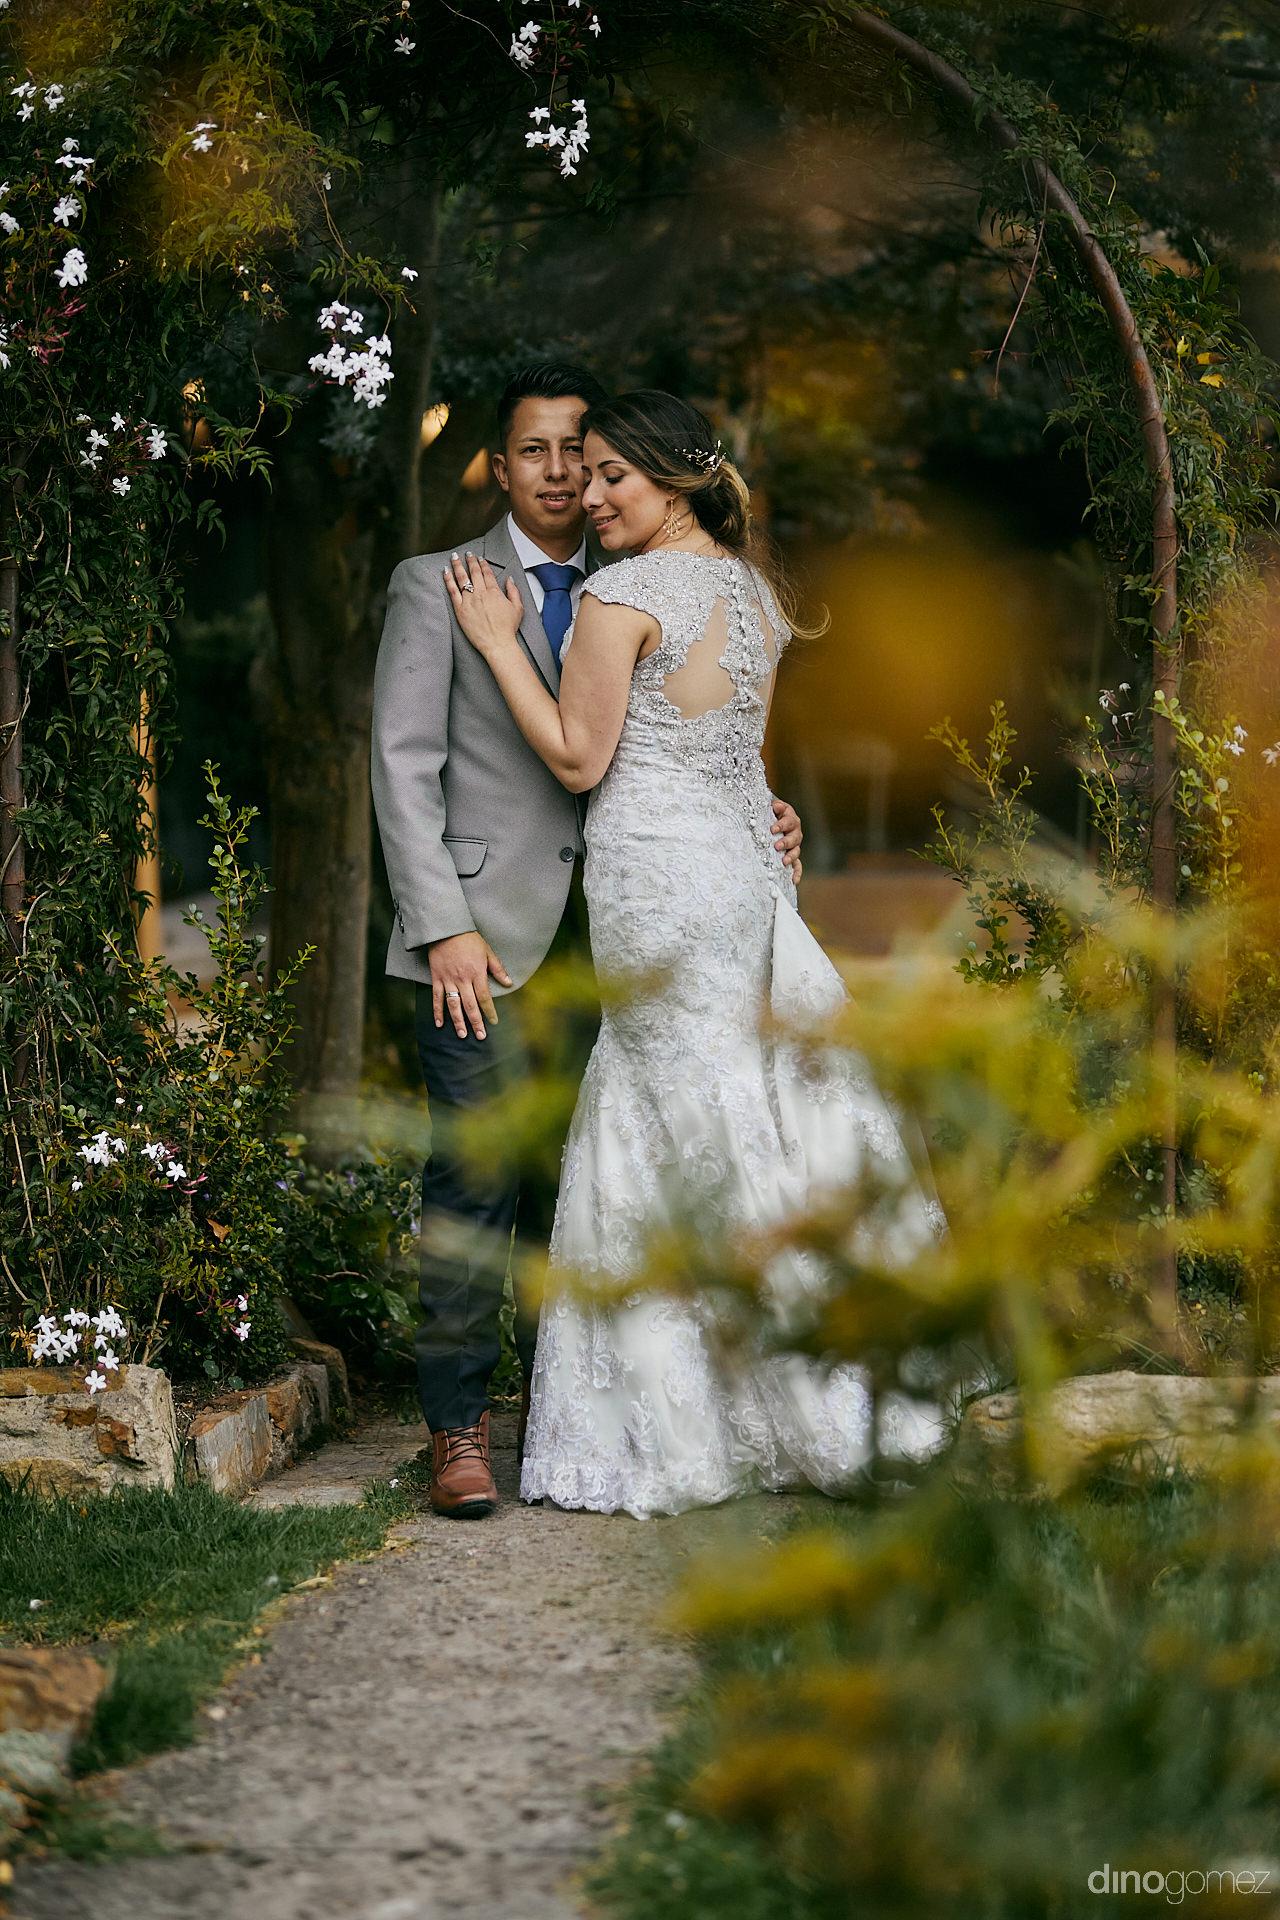 027 - Diy Budget Destination Weddings Can Be Prety Too!